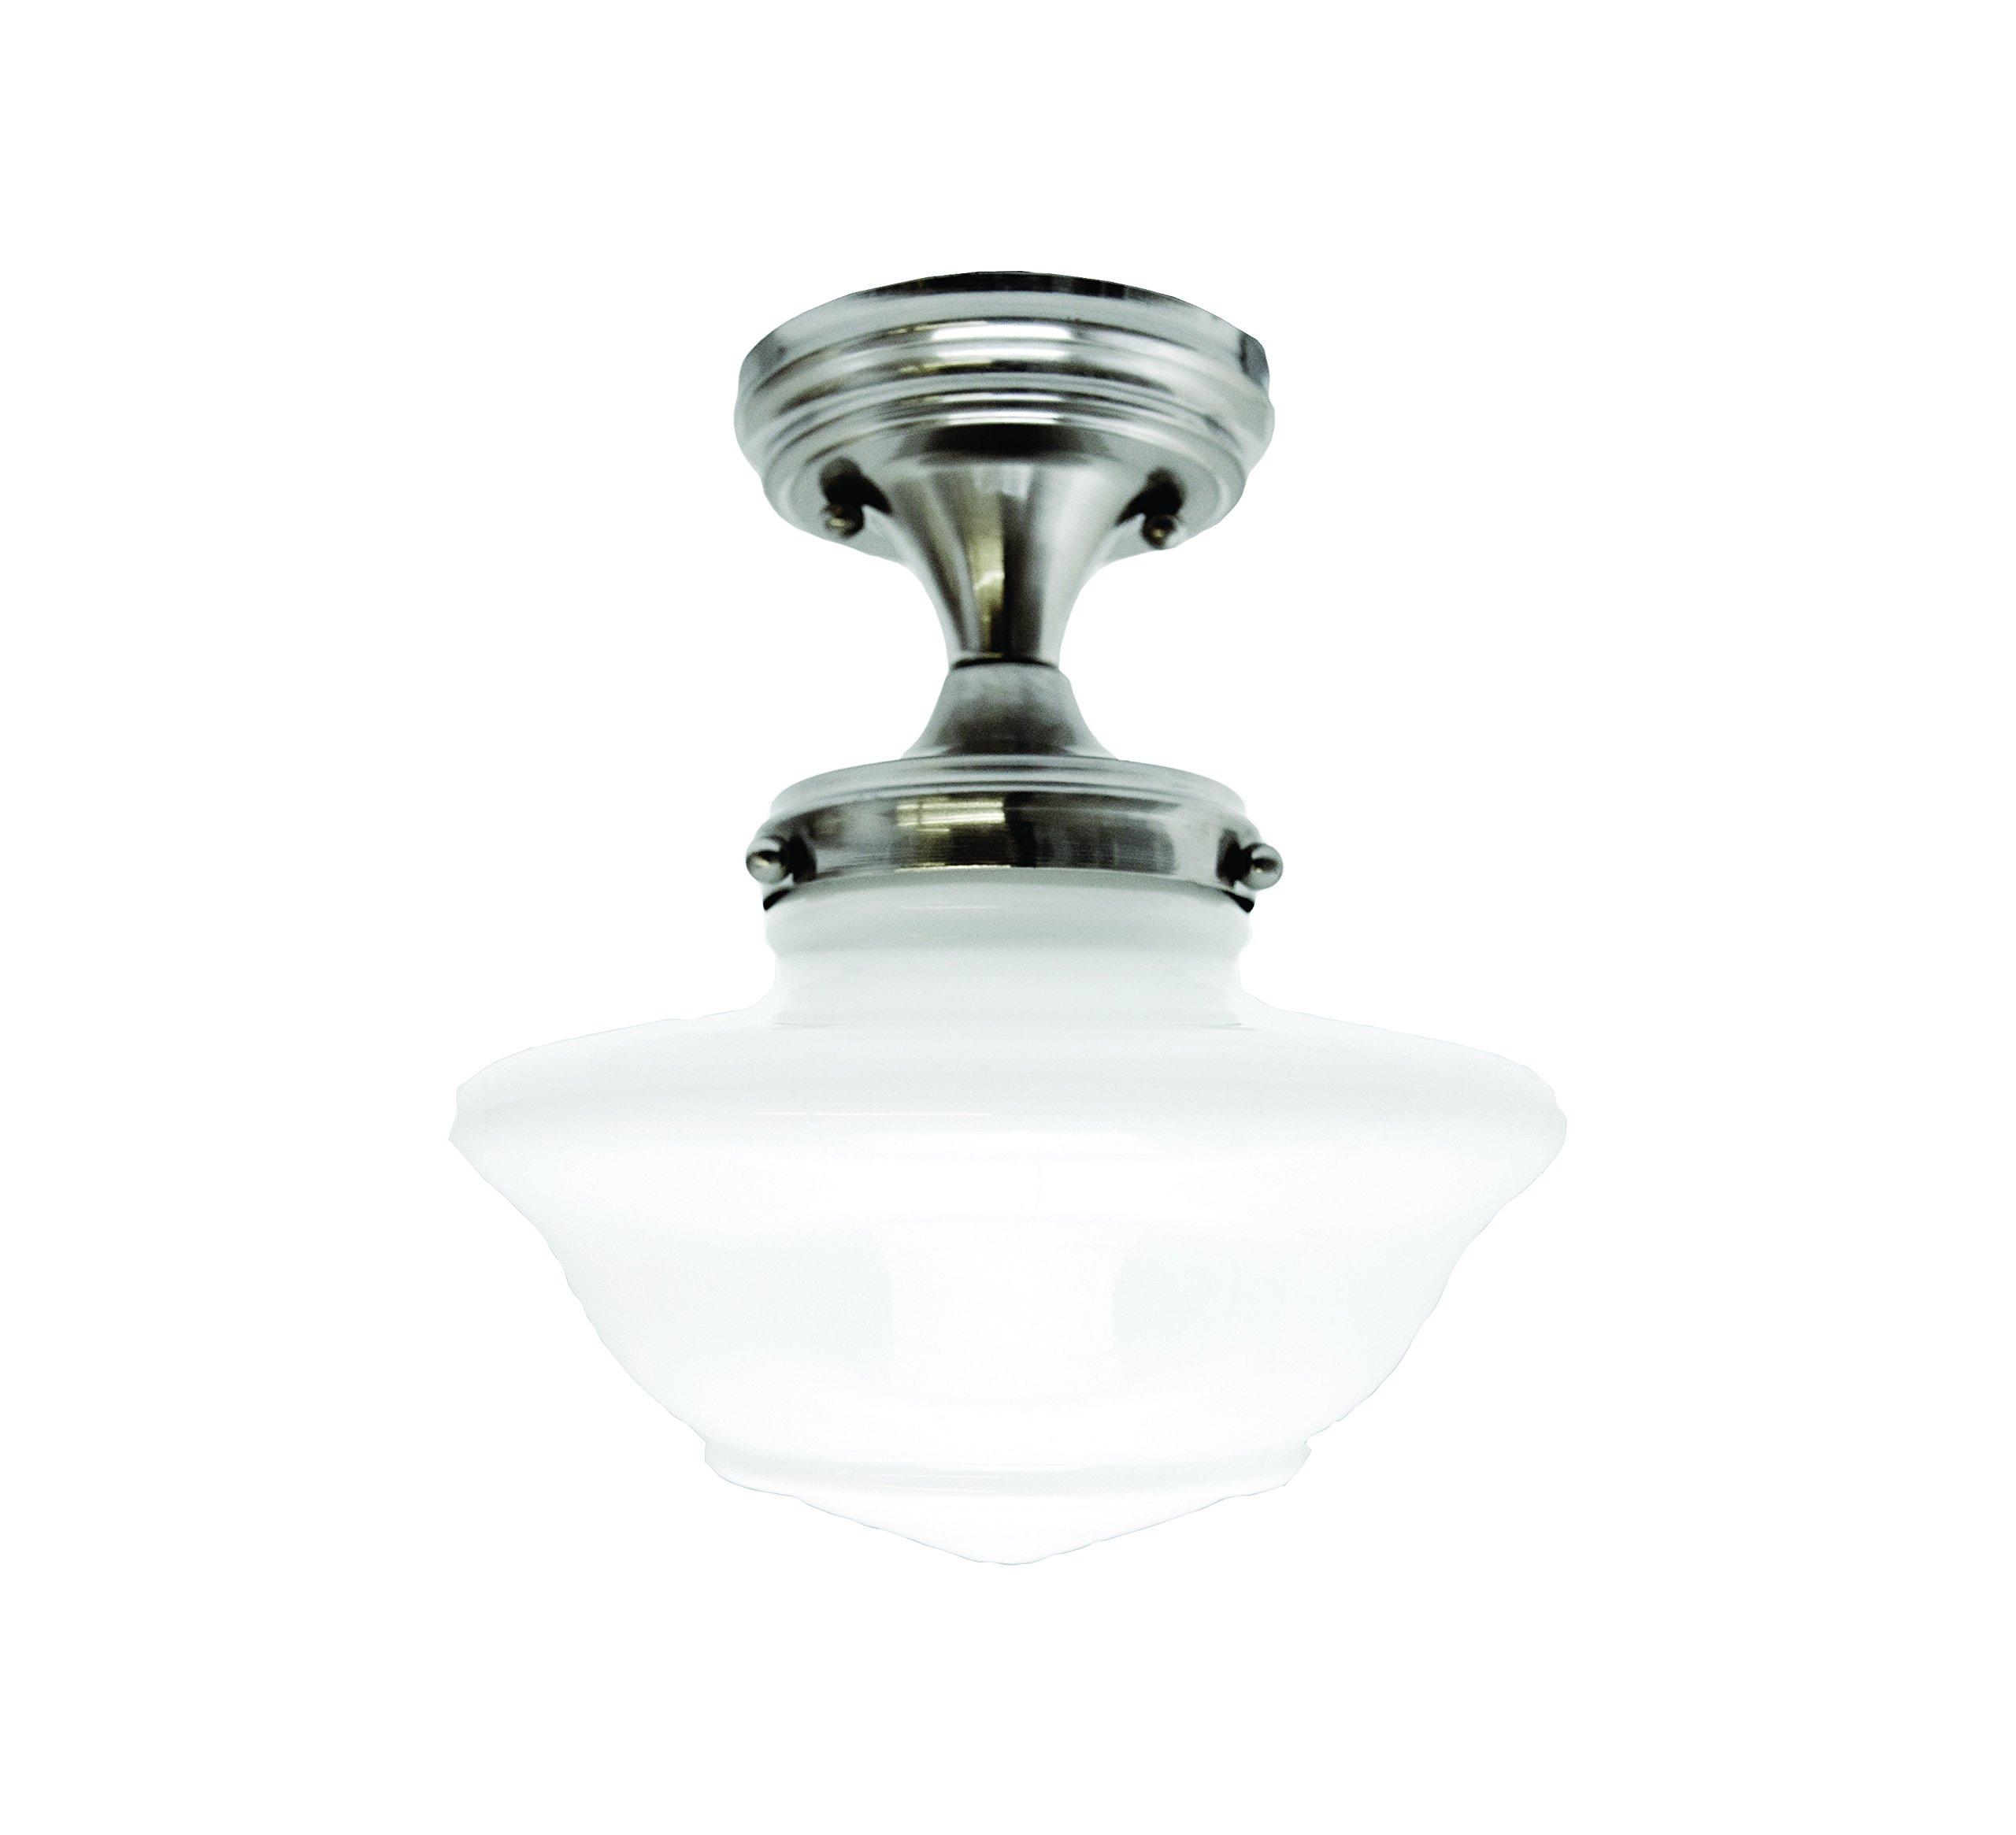 Design House 577494 Schoolhouse 1 Light Ceiling Light, Satin Nickel